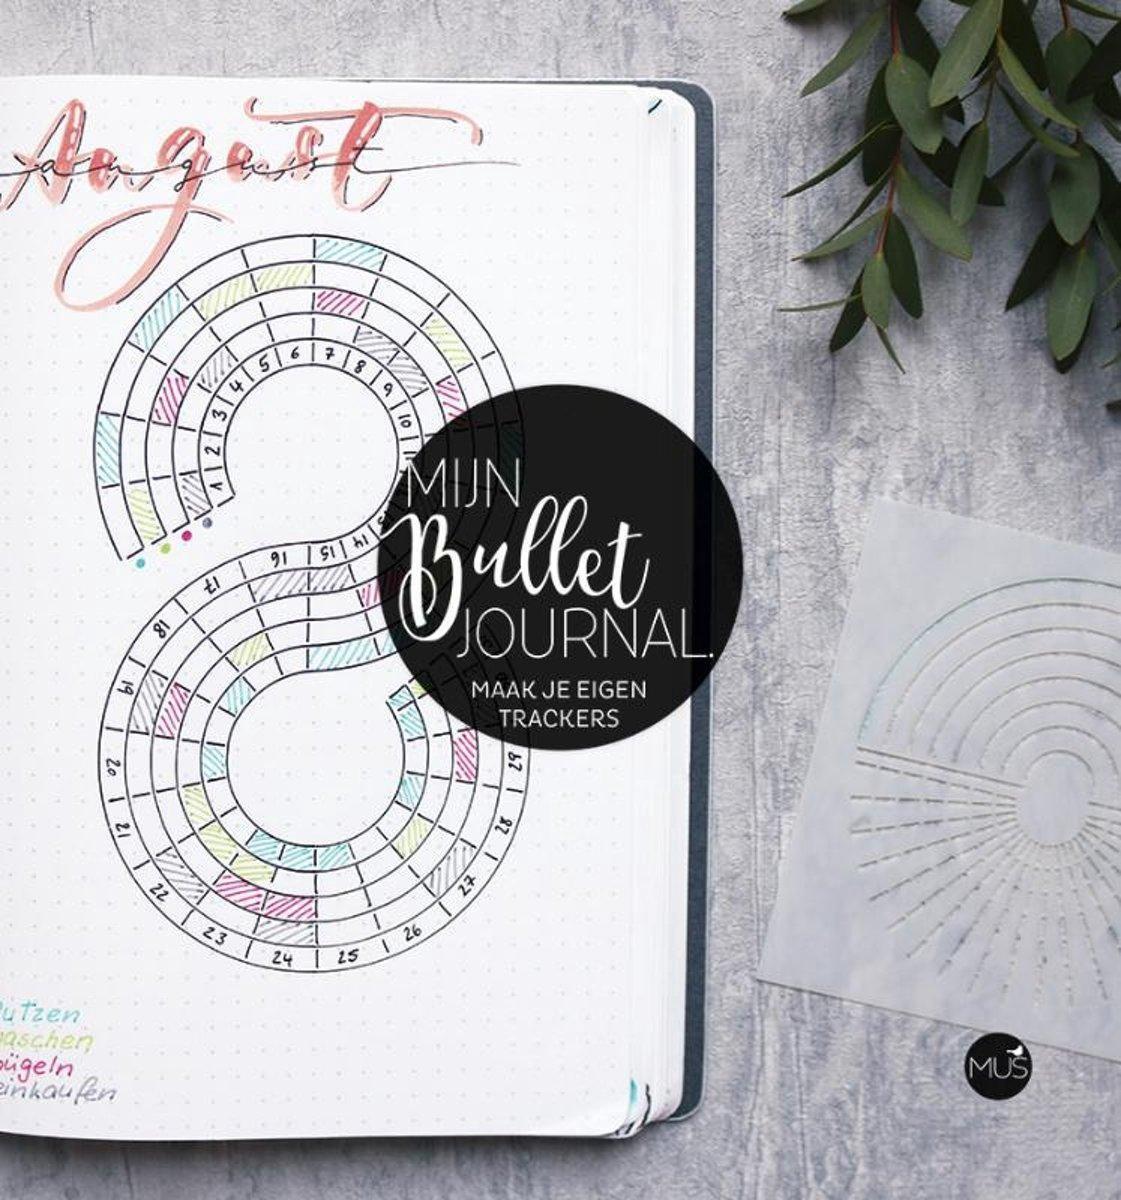 Mijn Bullet Journal - Maak je eigen Trackers + Bullet Journal Guide Ruler - Tracker